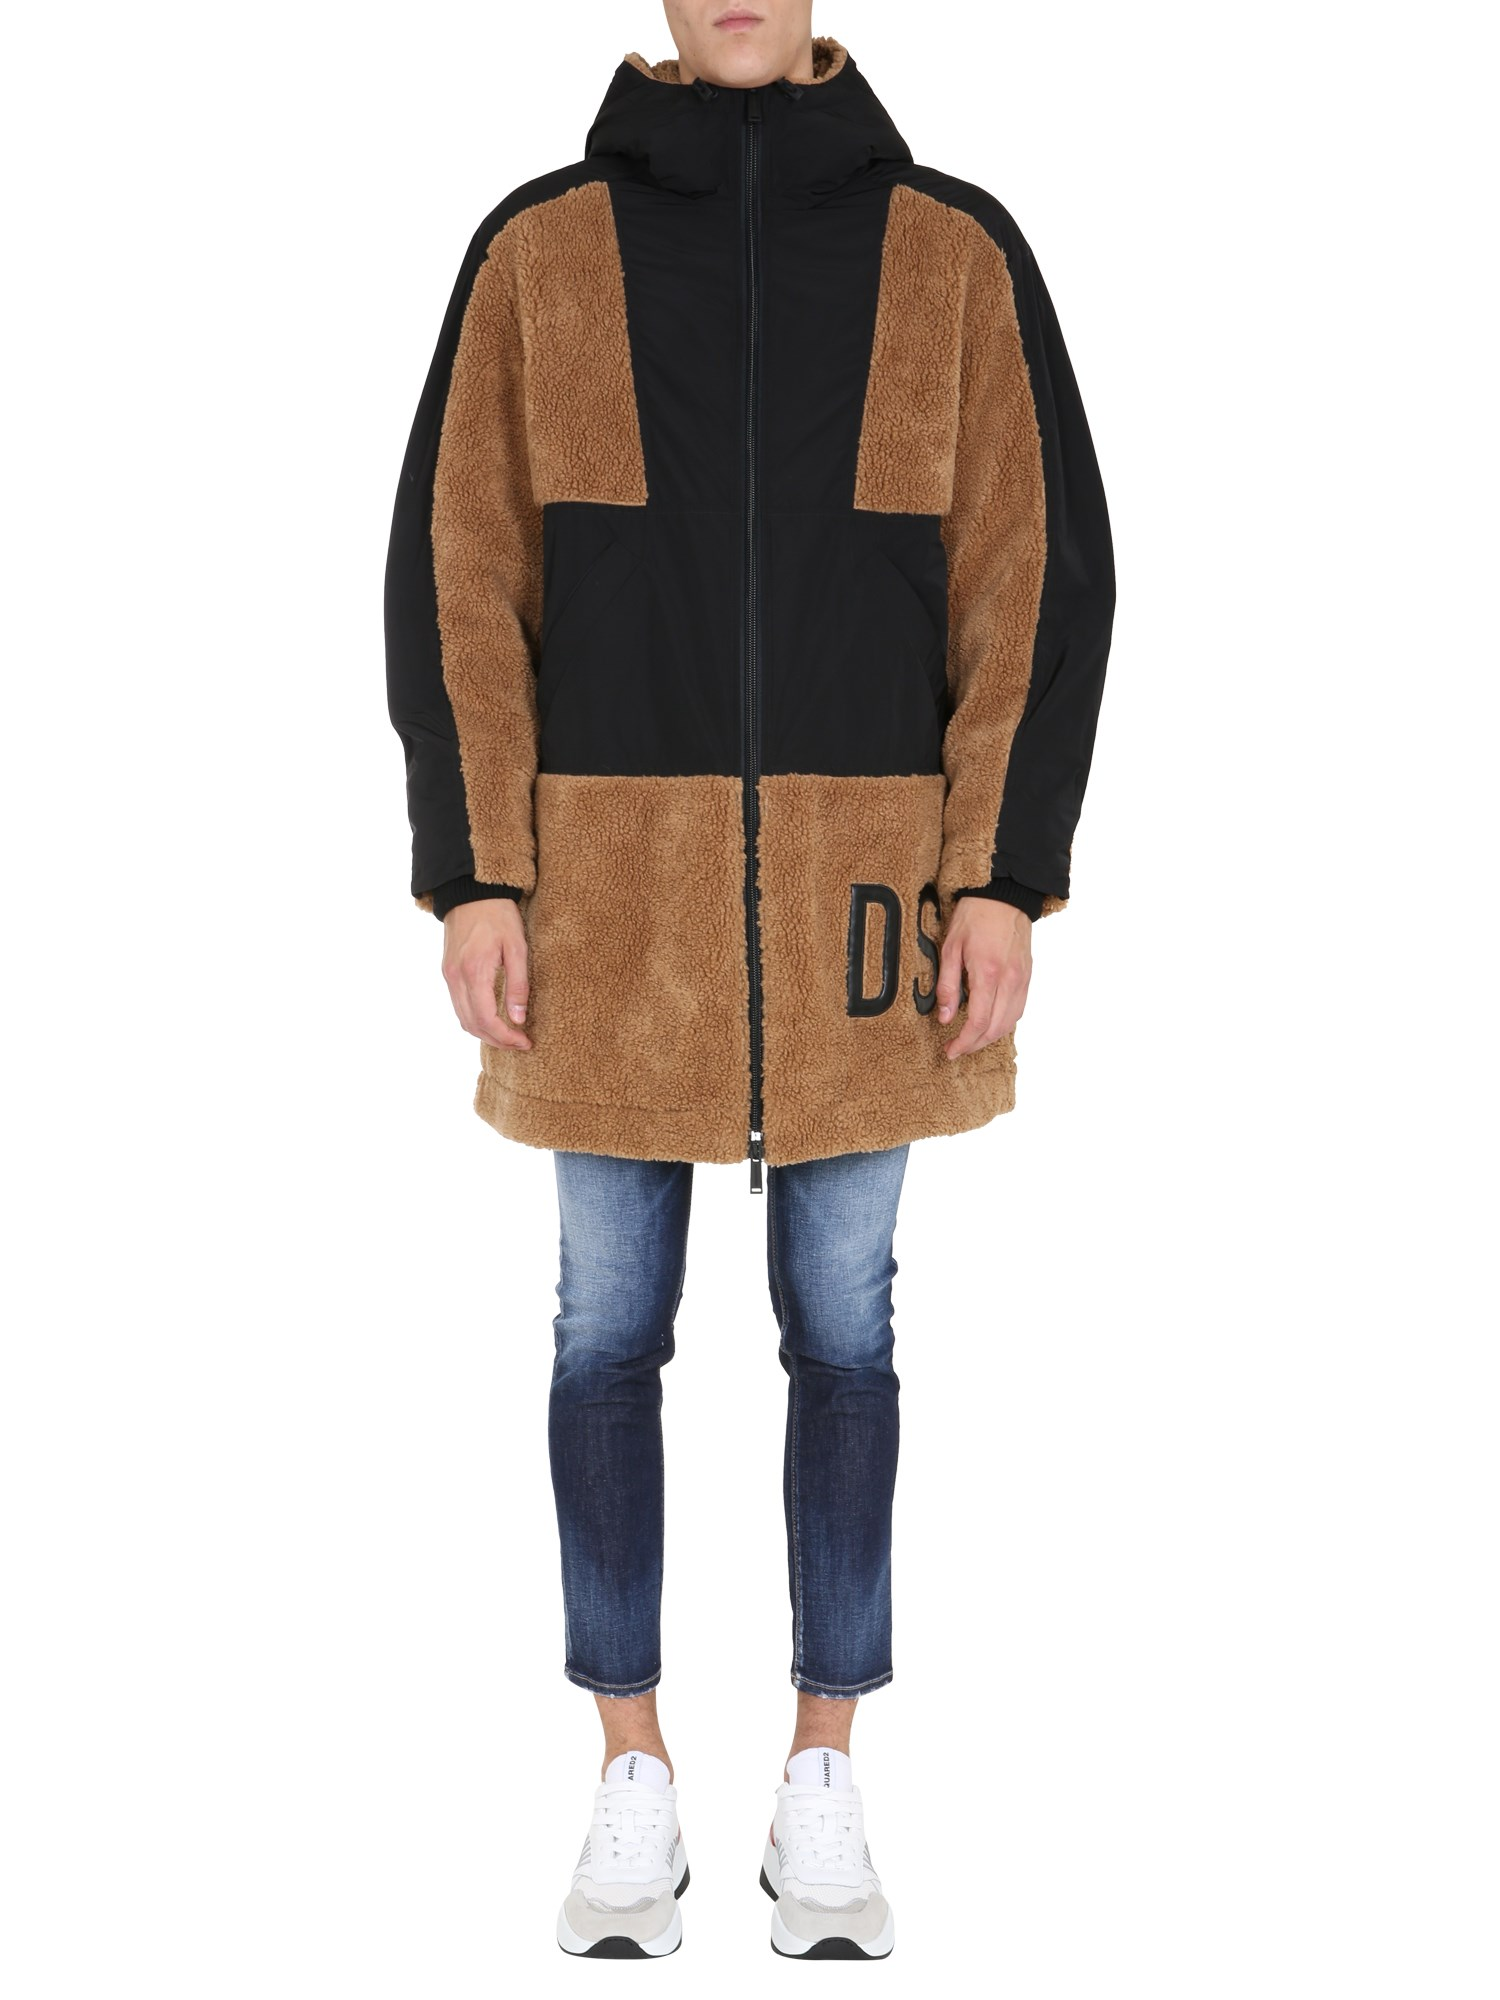 Dsquared coat with logo - dsquared - Modalova